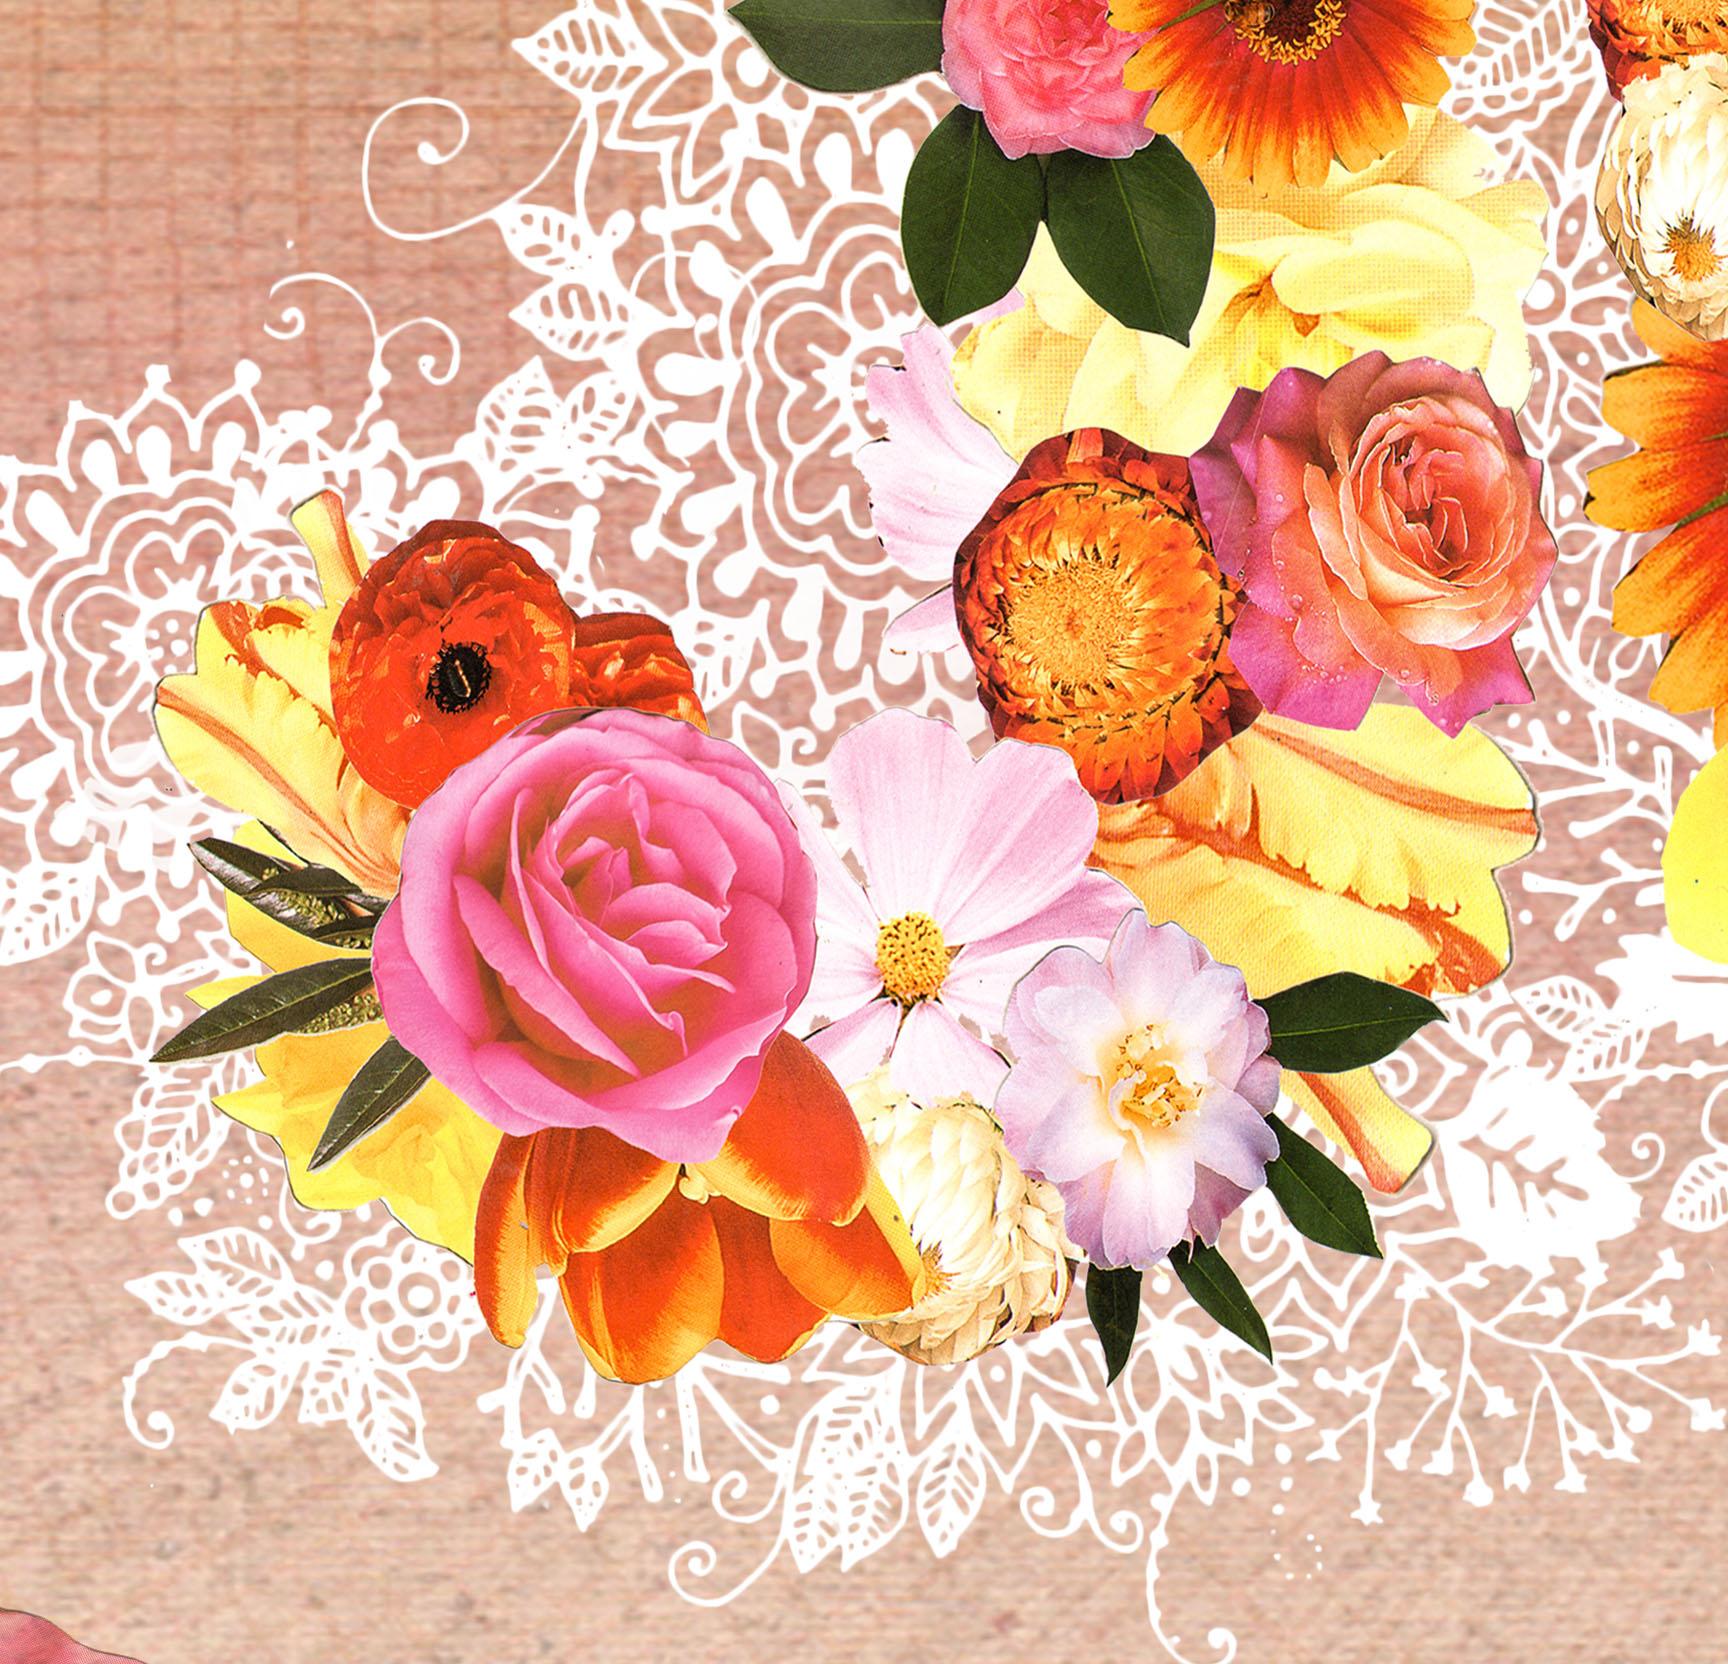 Choose Joy 16 X 20 Paper Print Flowers Hummingbirds Mixed Media